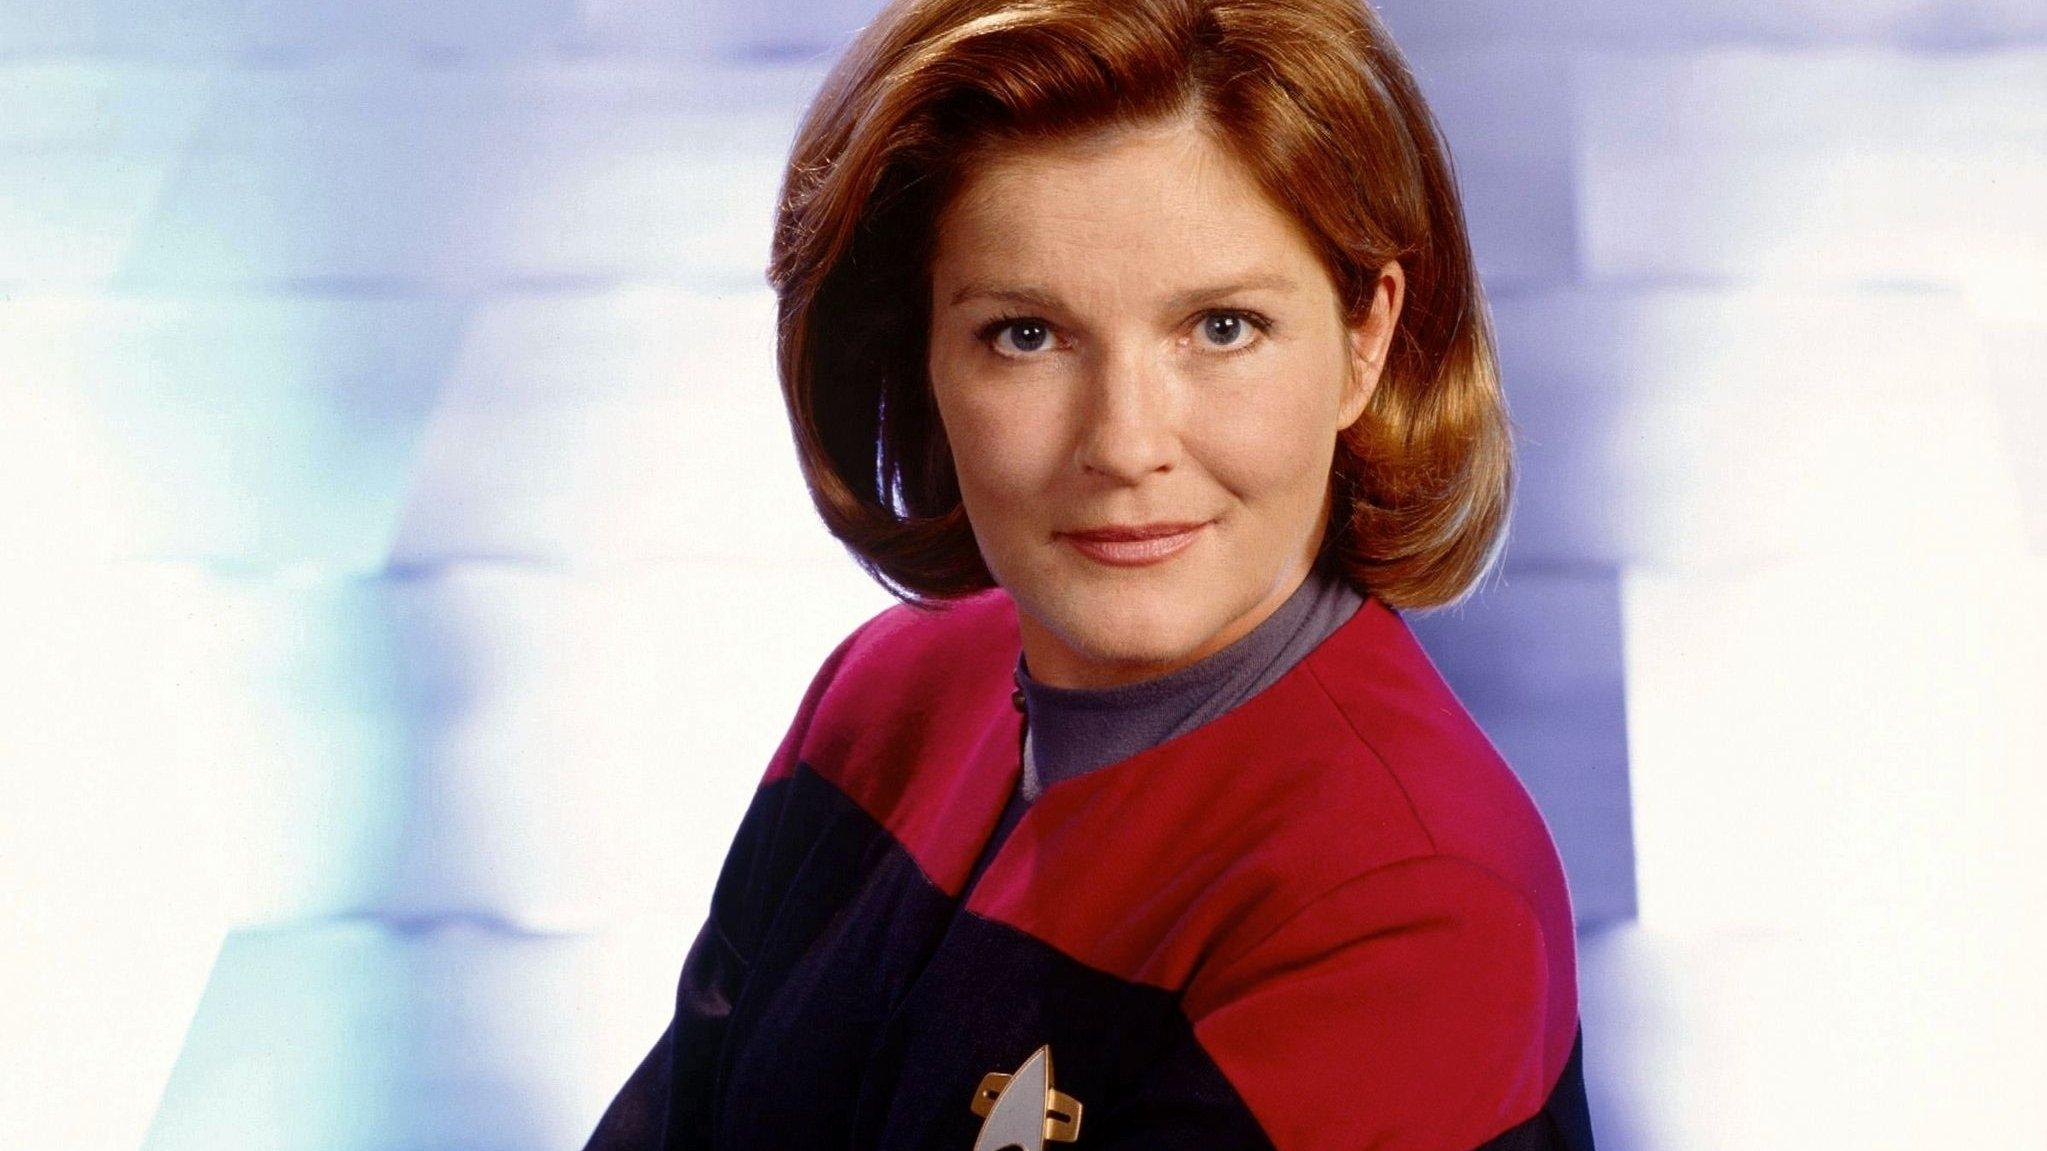 Star Trek: Voyager Spinoff Being Planned & Other Huge Star Trek News - cover